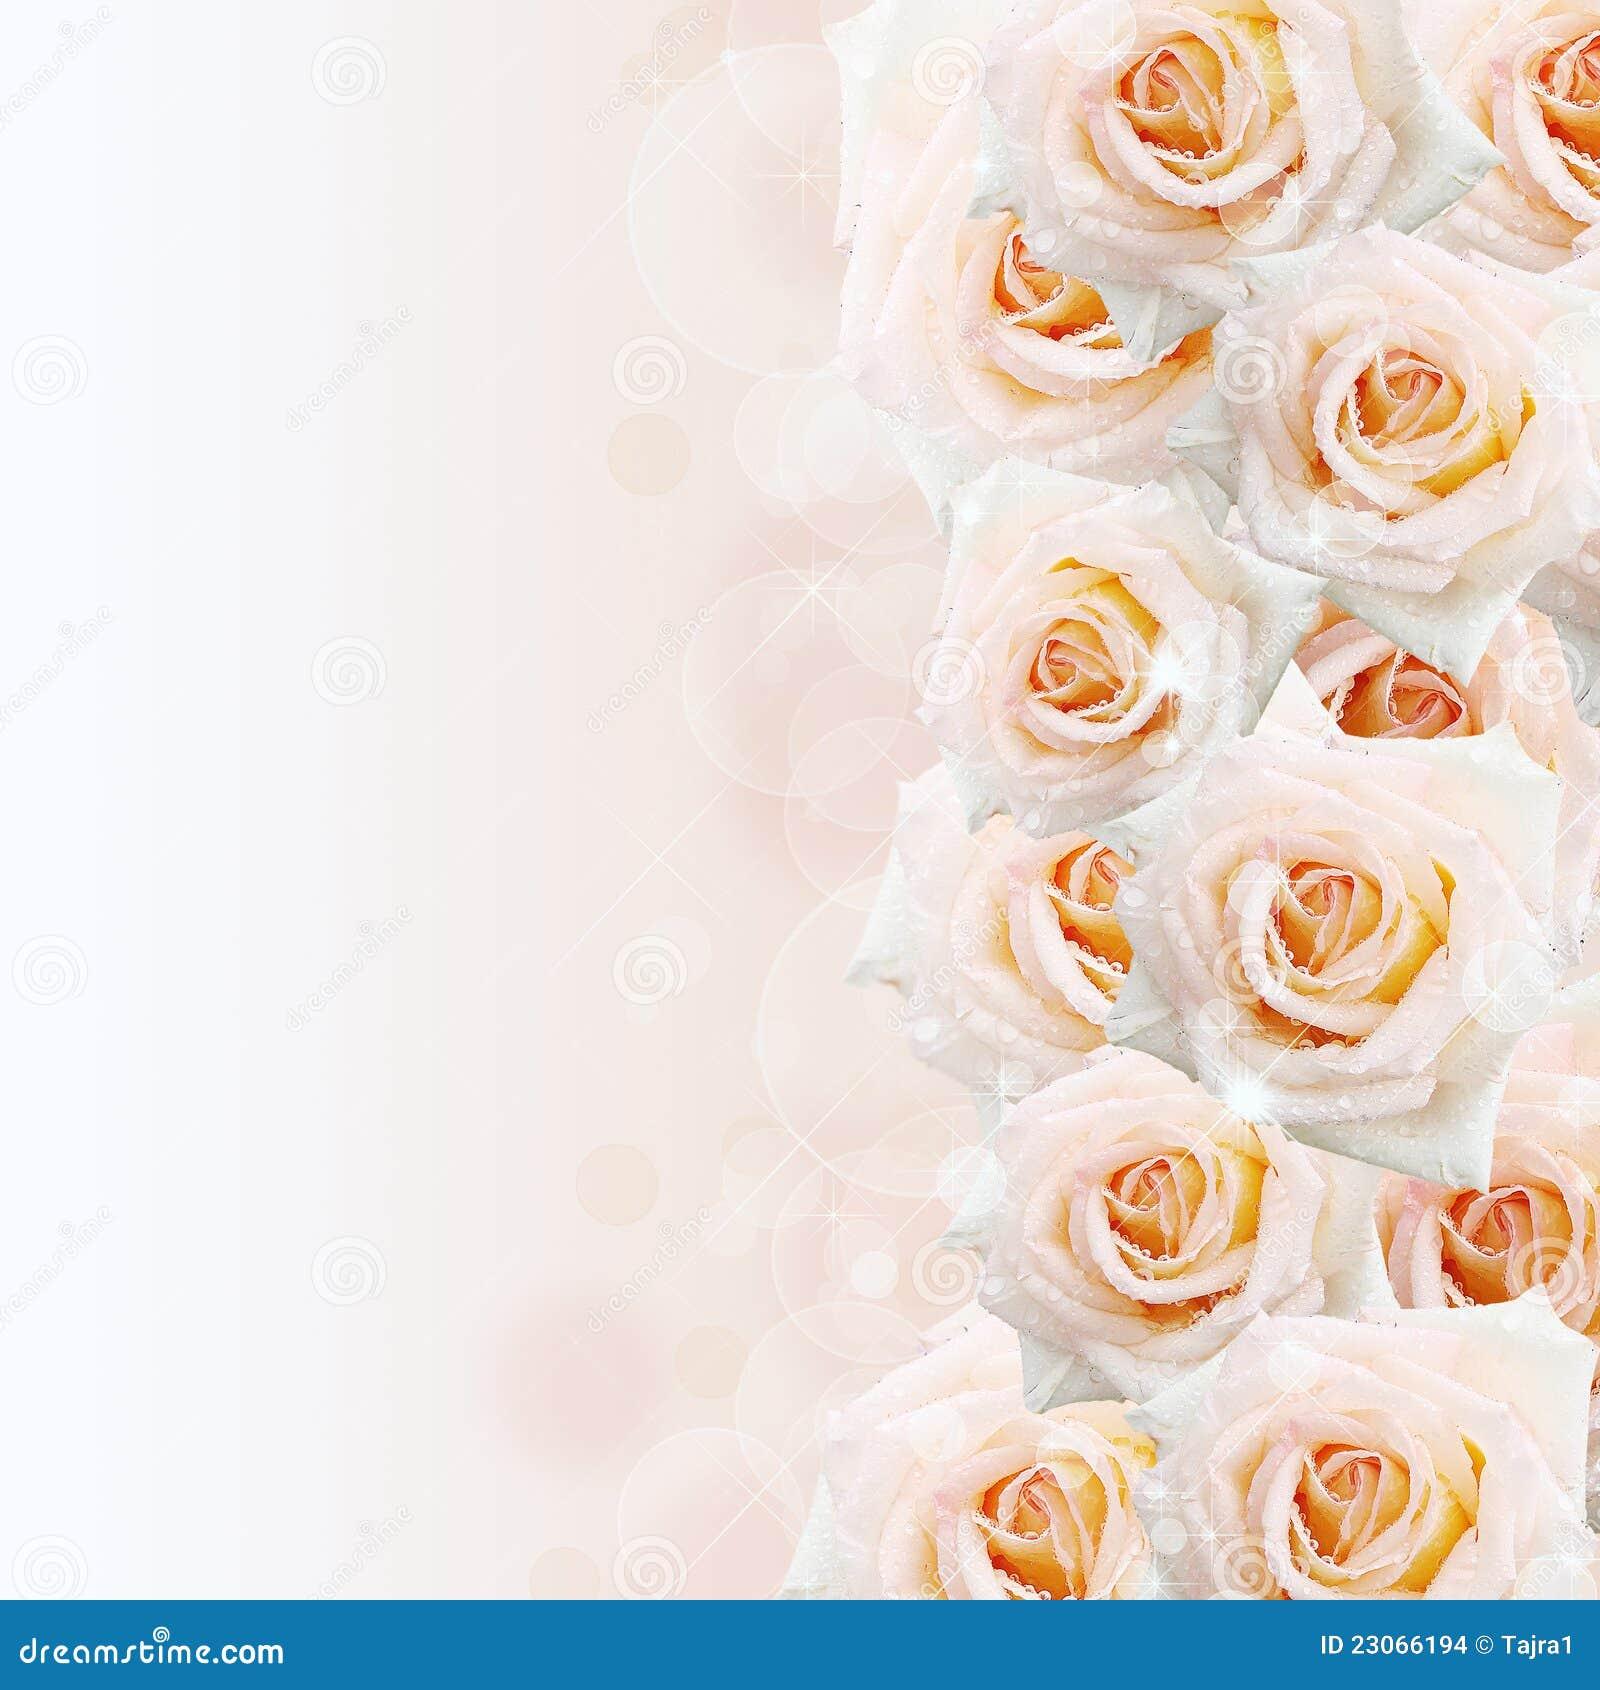 Cream roses background stock images image 23066194 for Cream rose wallpaper